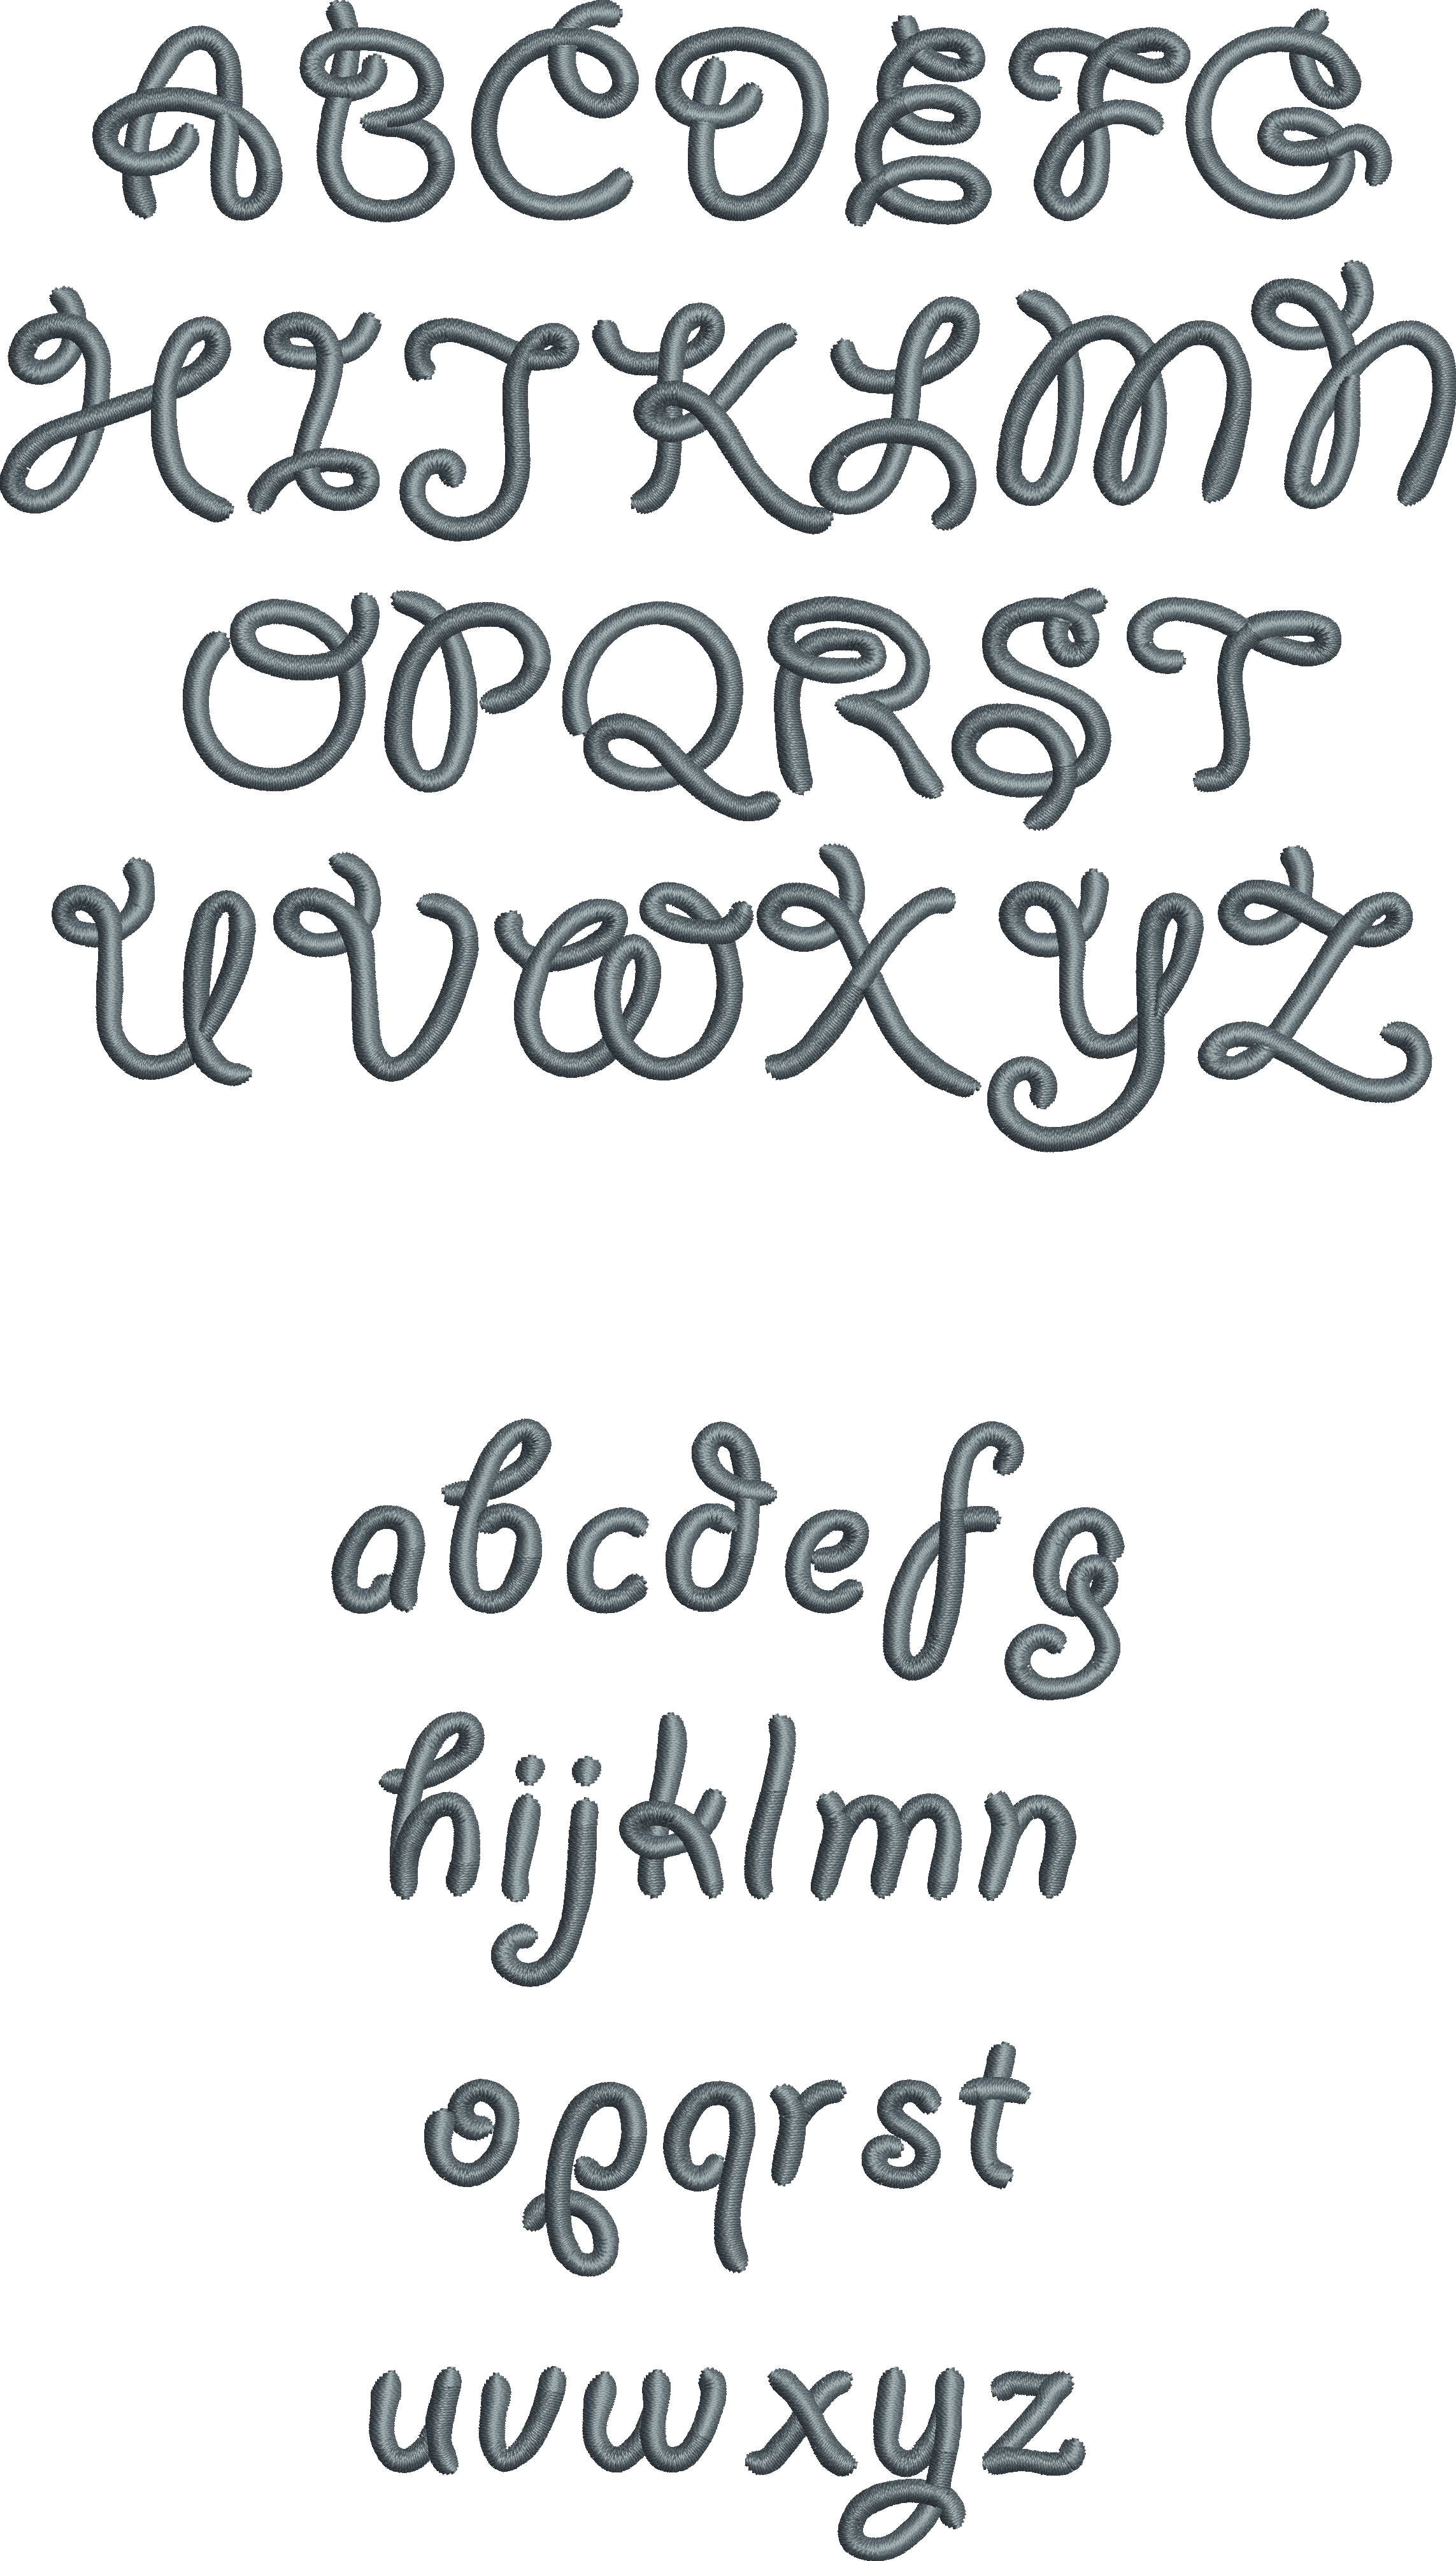 00 Lariat Font Board.PNG